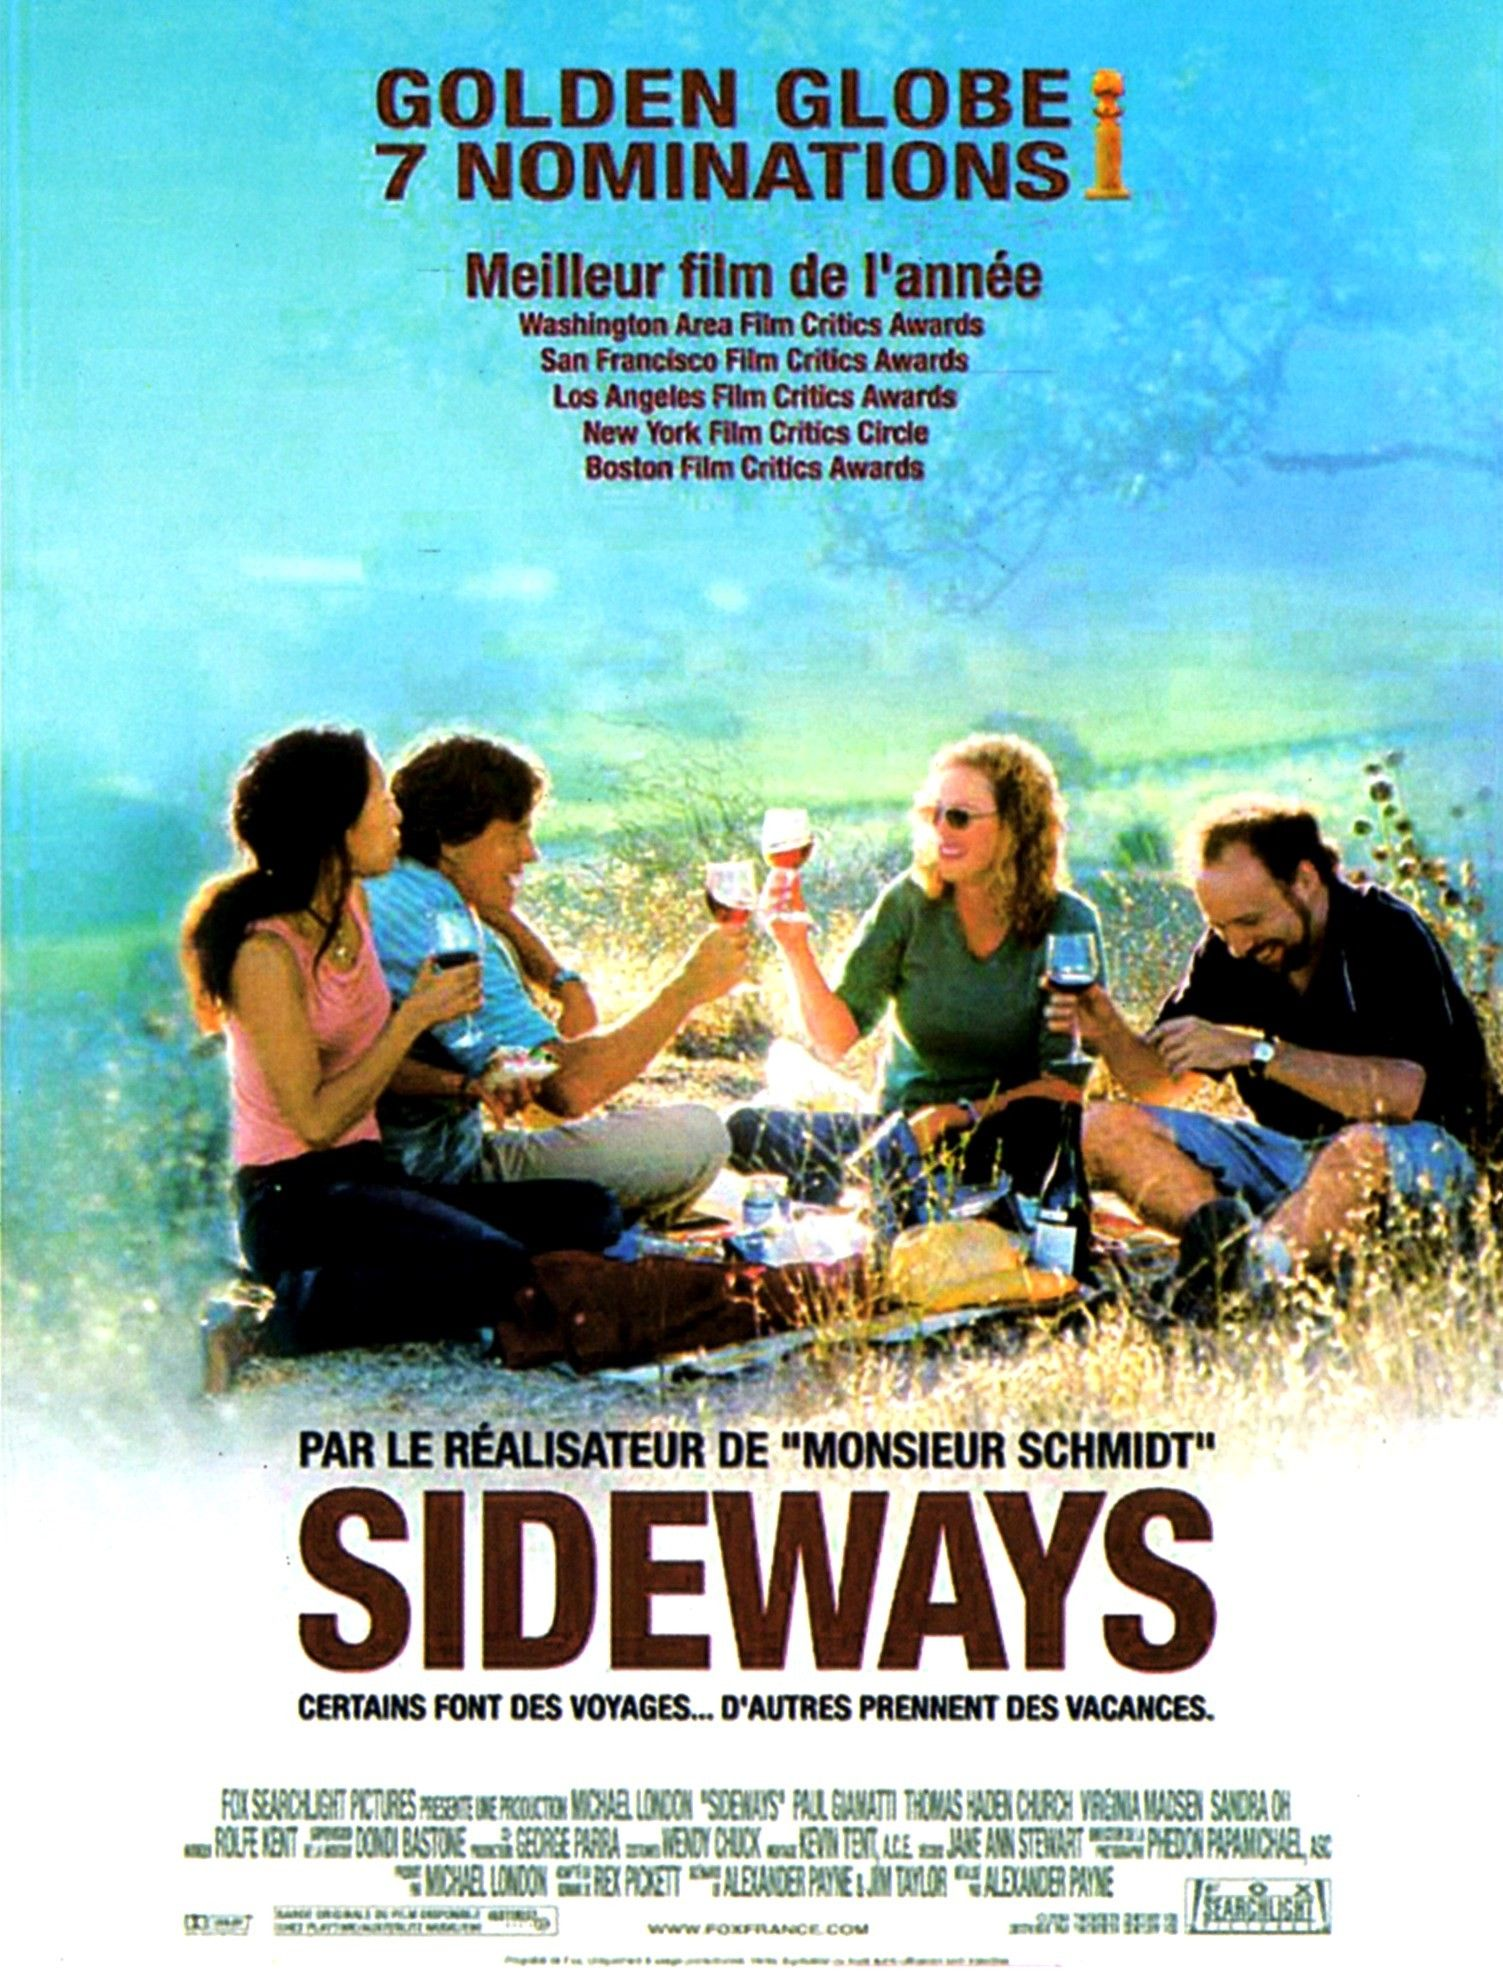 Allo Movies Streaming 2005 sideways   cloud movies, romantic movies, top romantic